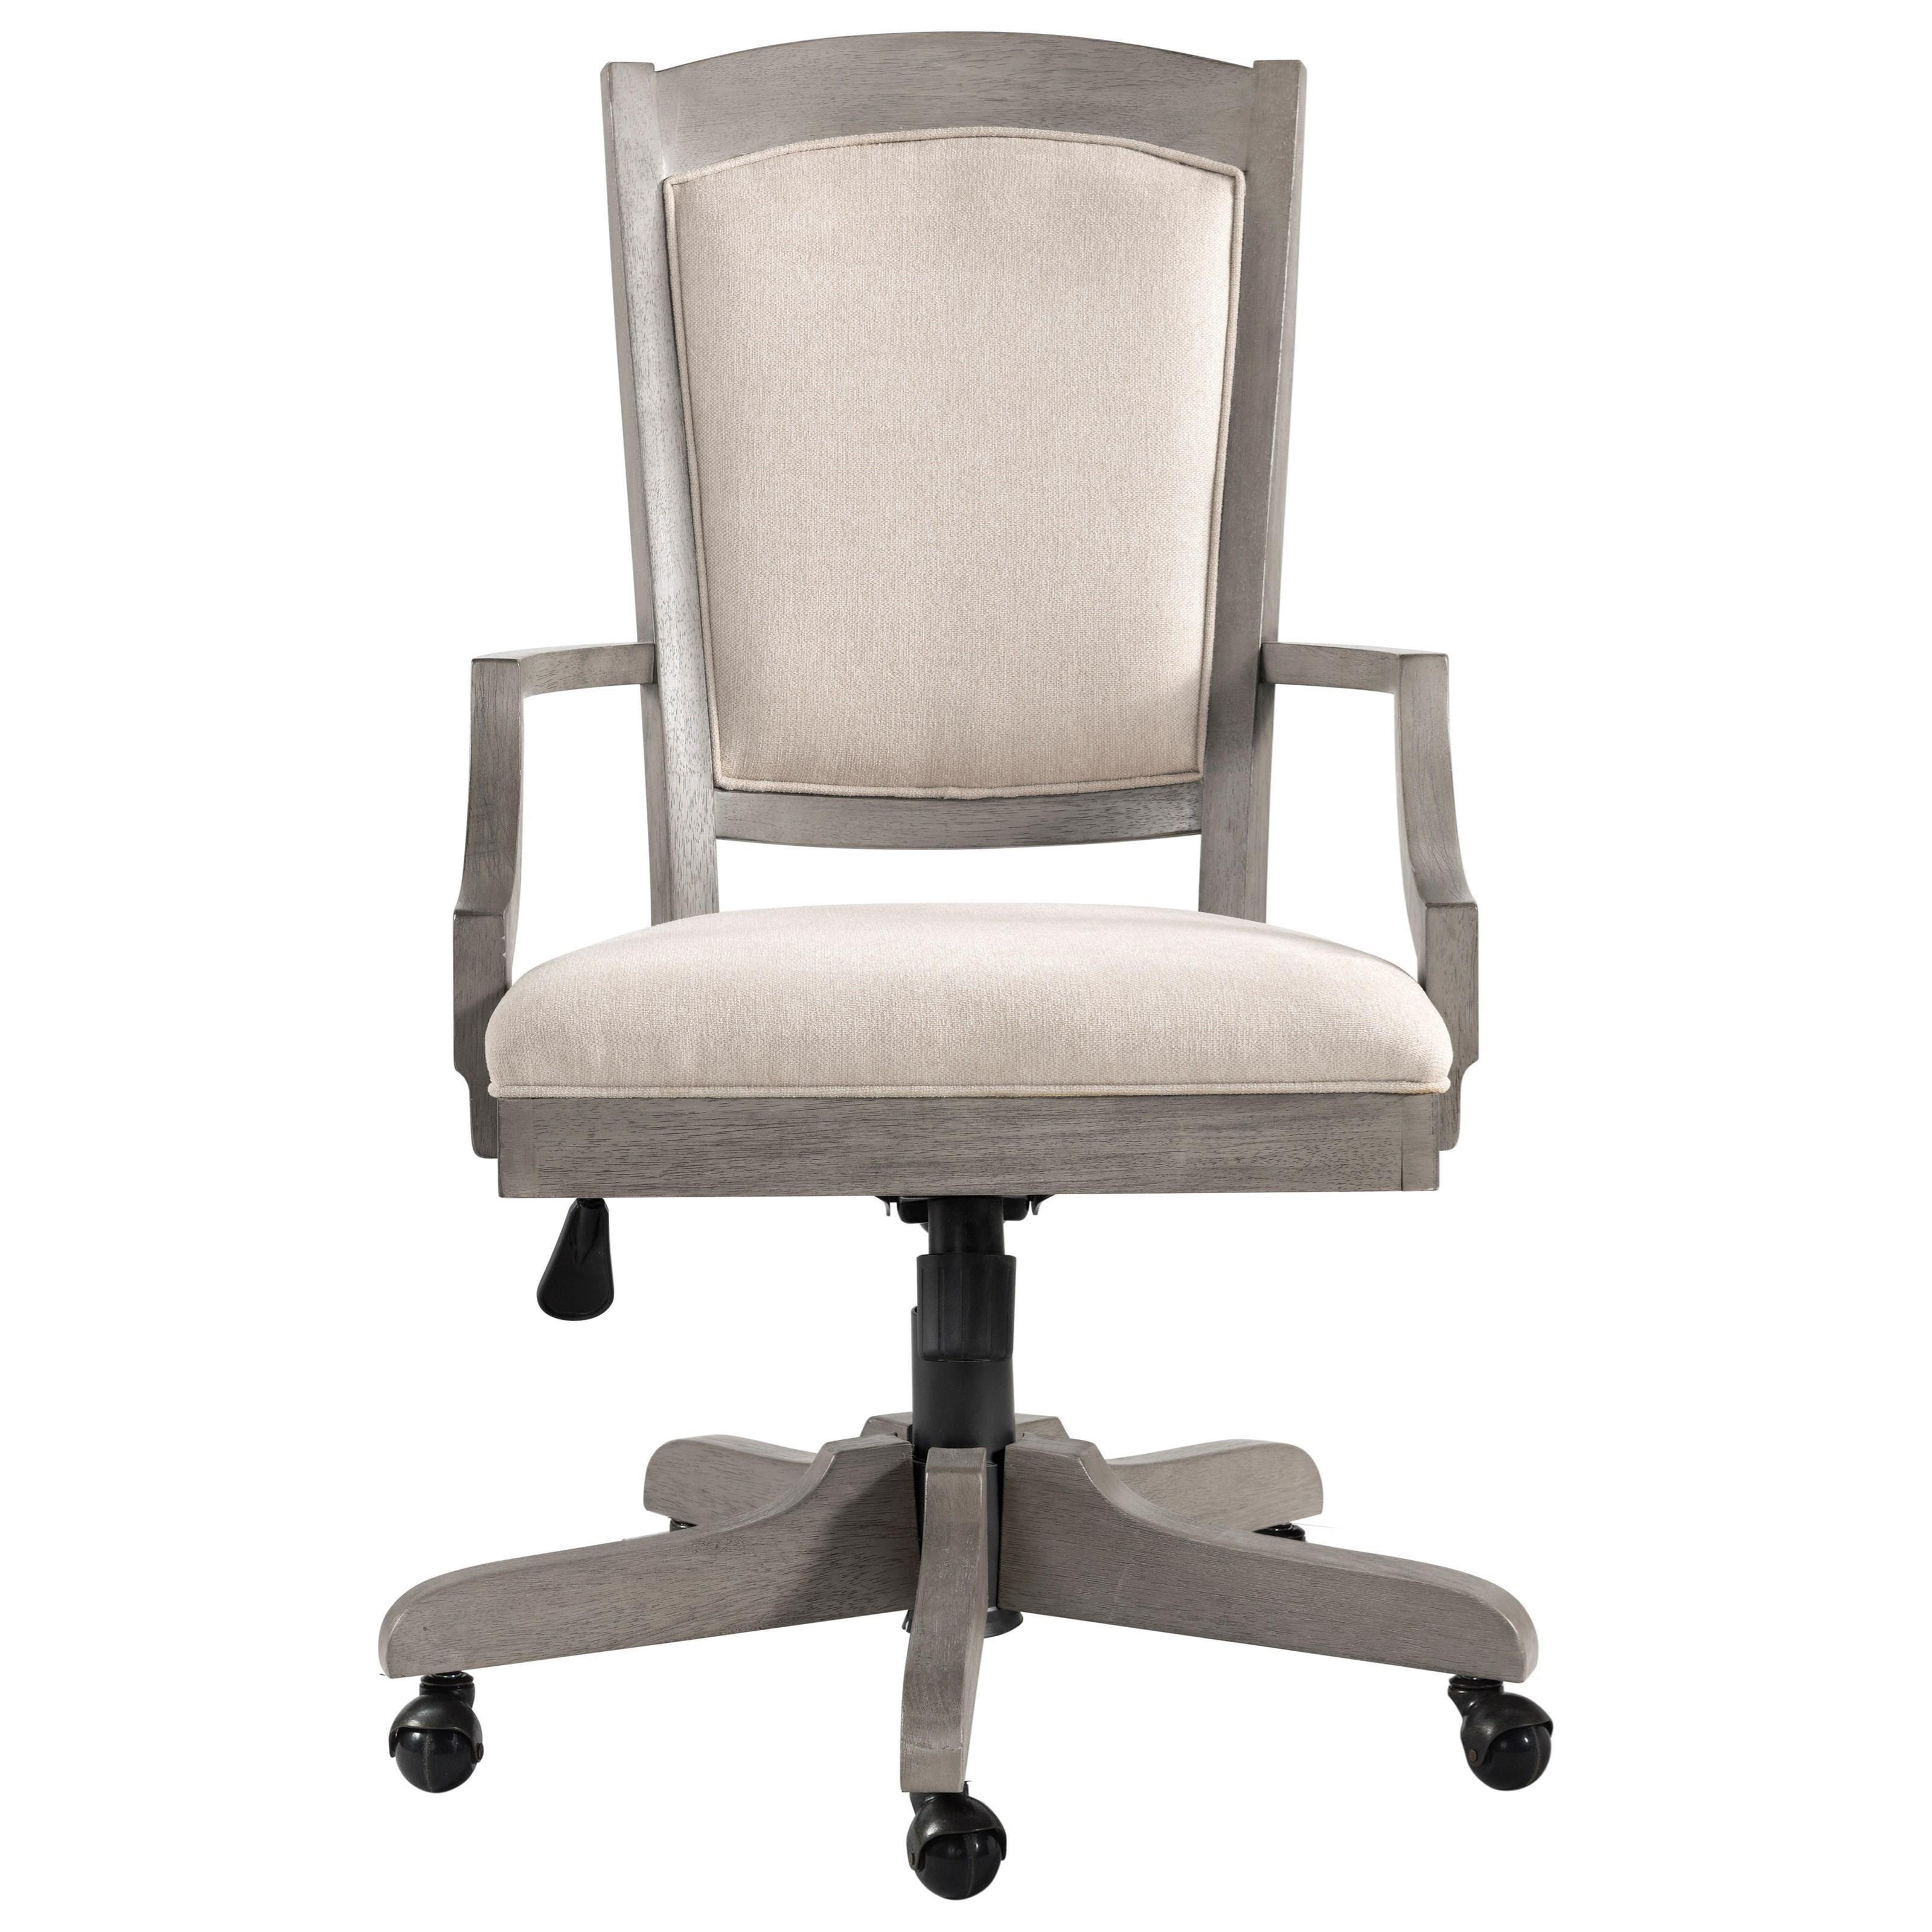 Sloane Upholstered Desk Chair by Riverside Furniture at Zak's Home